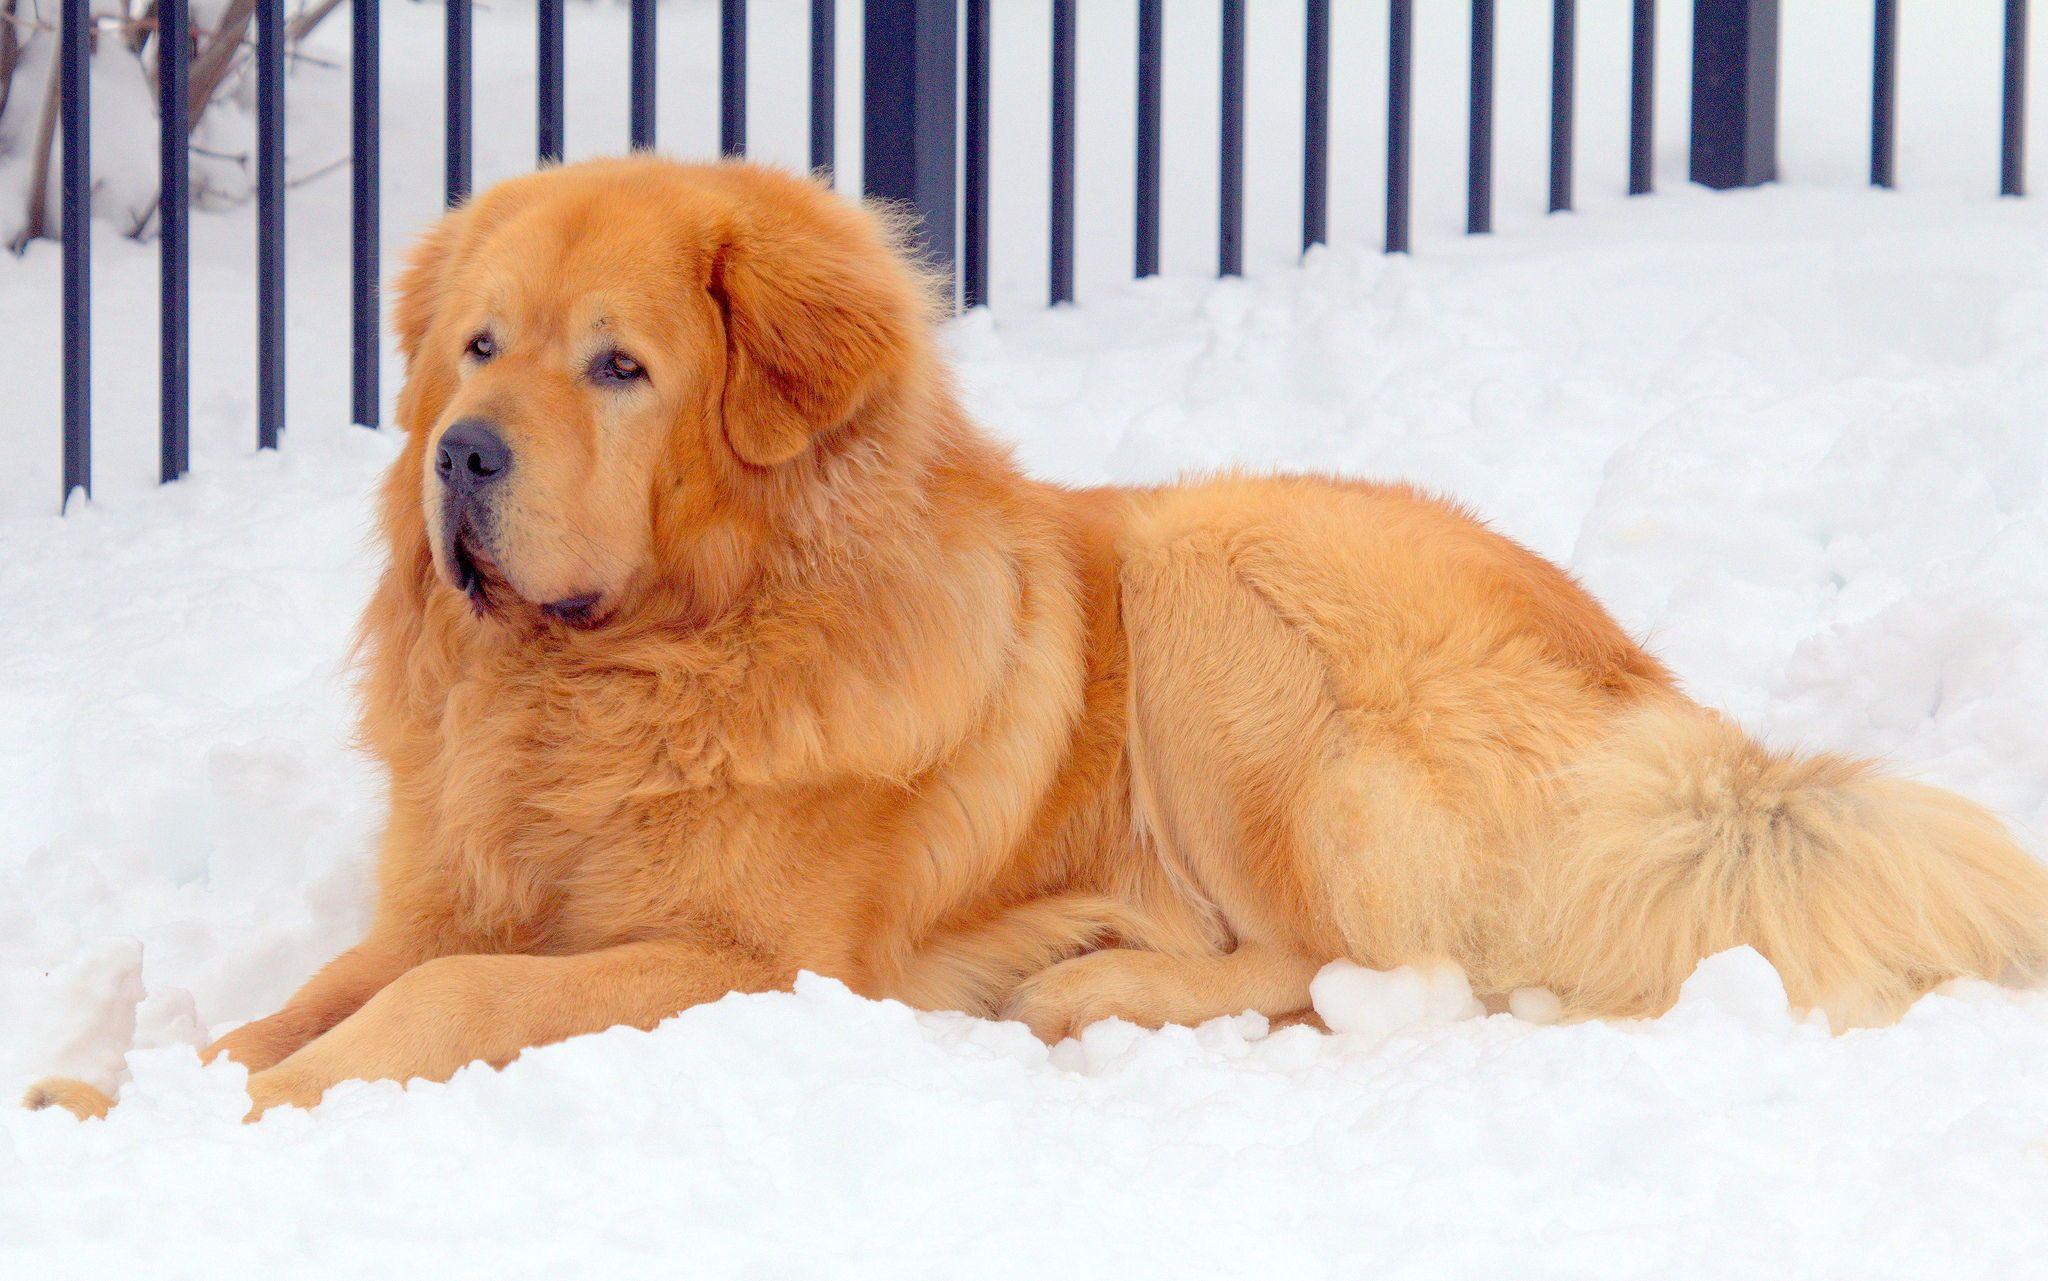 Tibetan Mastiff Information, Characteristics, Facts